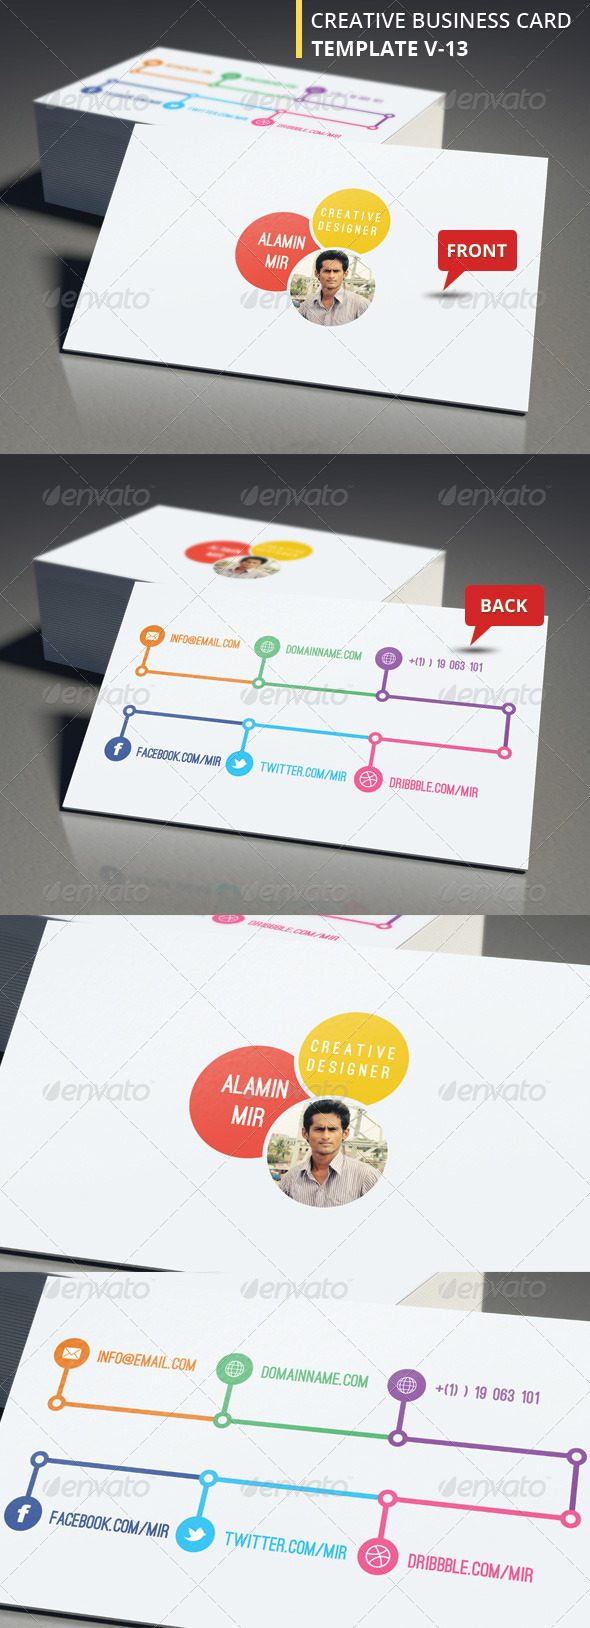 Creative Business Card V 13 - Creative Business Cards